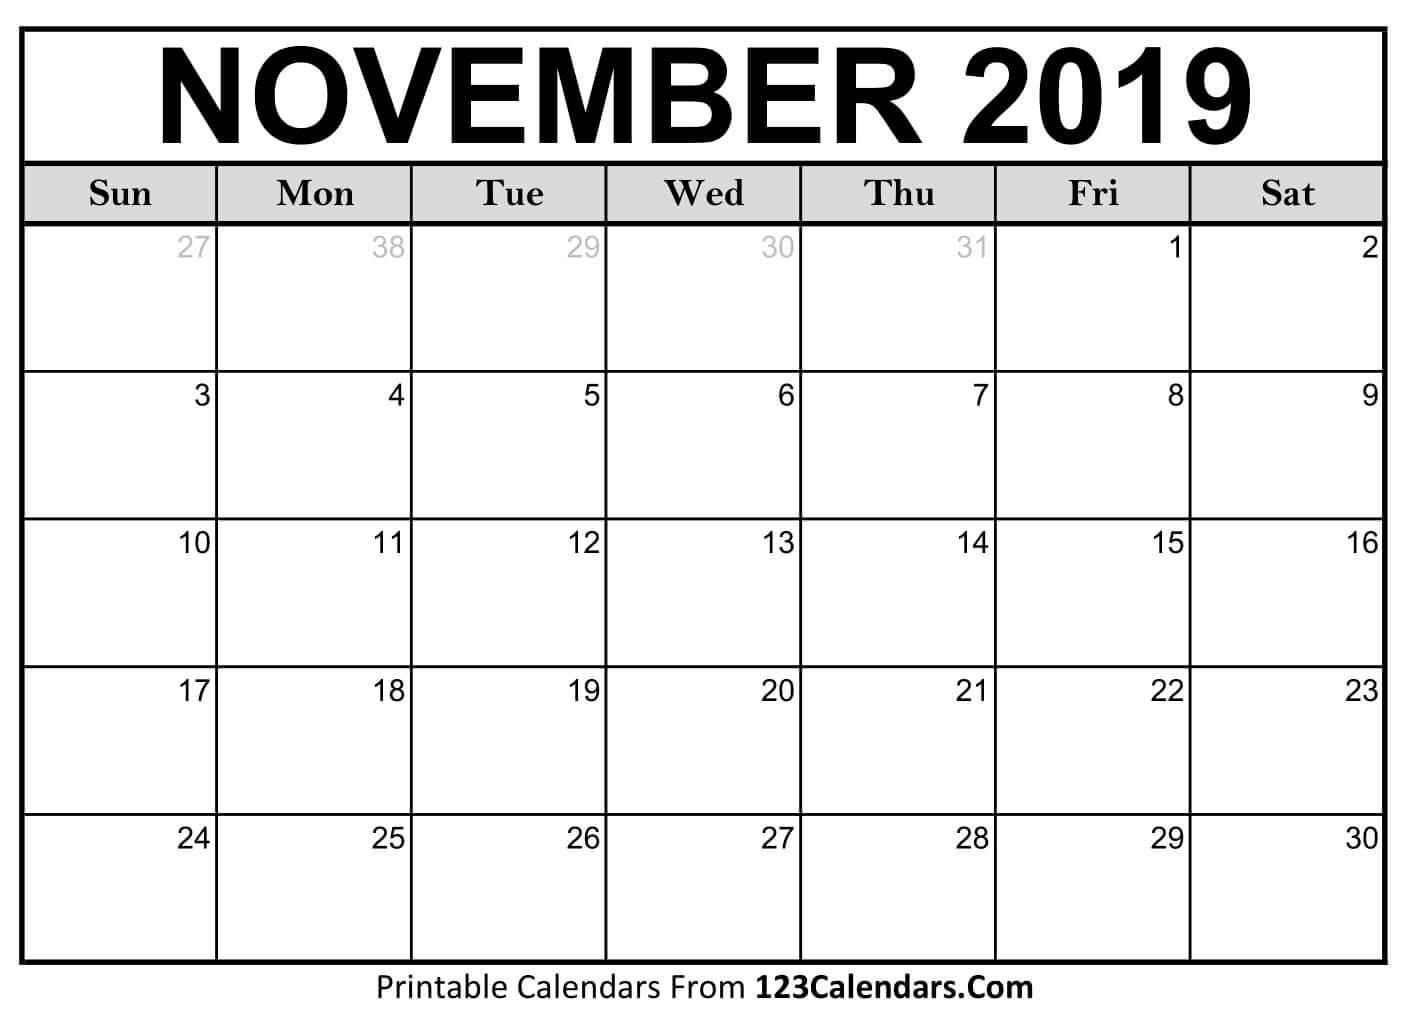 Printable November 2019 Calendar Templates – 123Calendars Calendar 2019 Nov